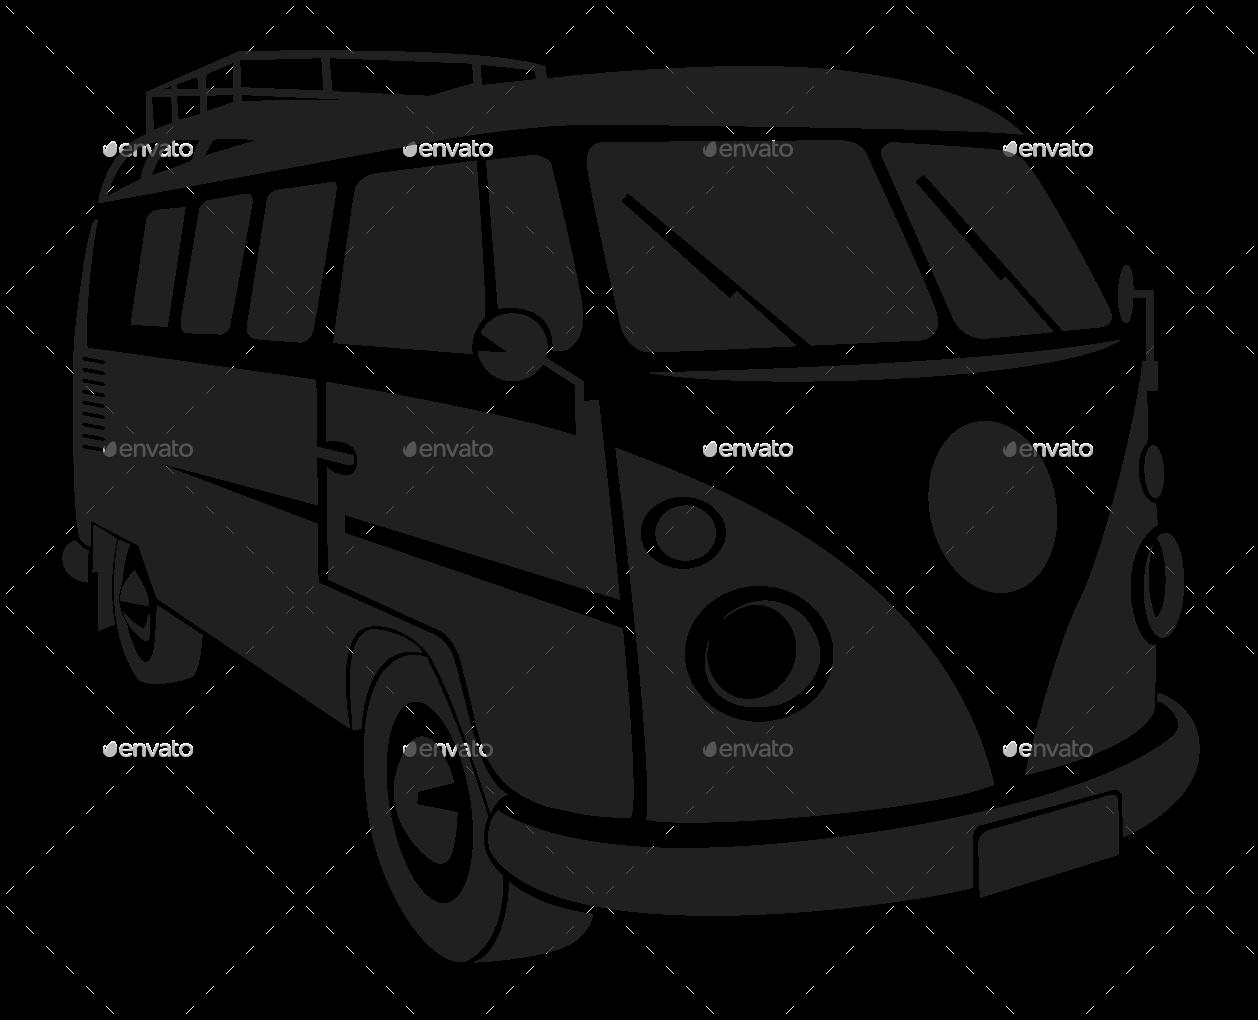 vector logo clip art 93t2bjx